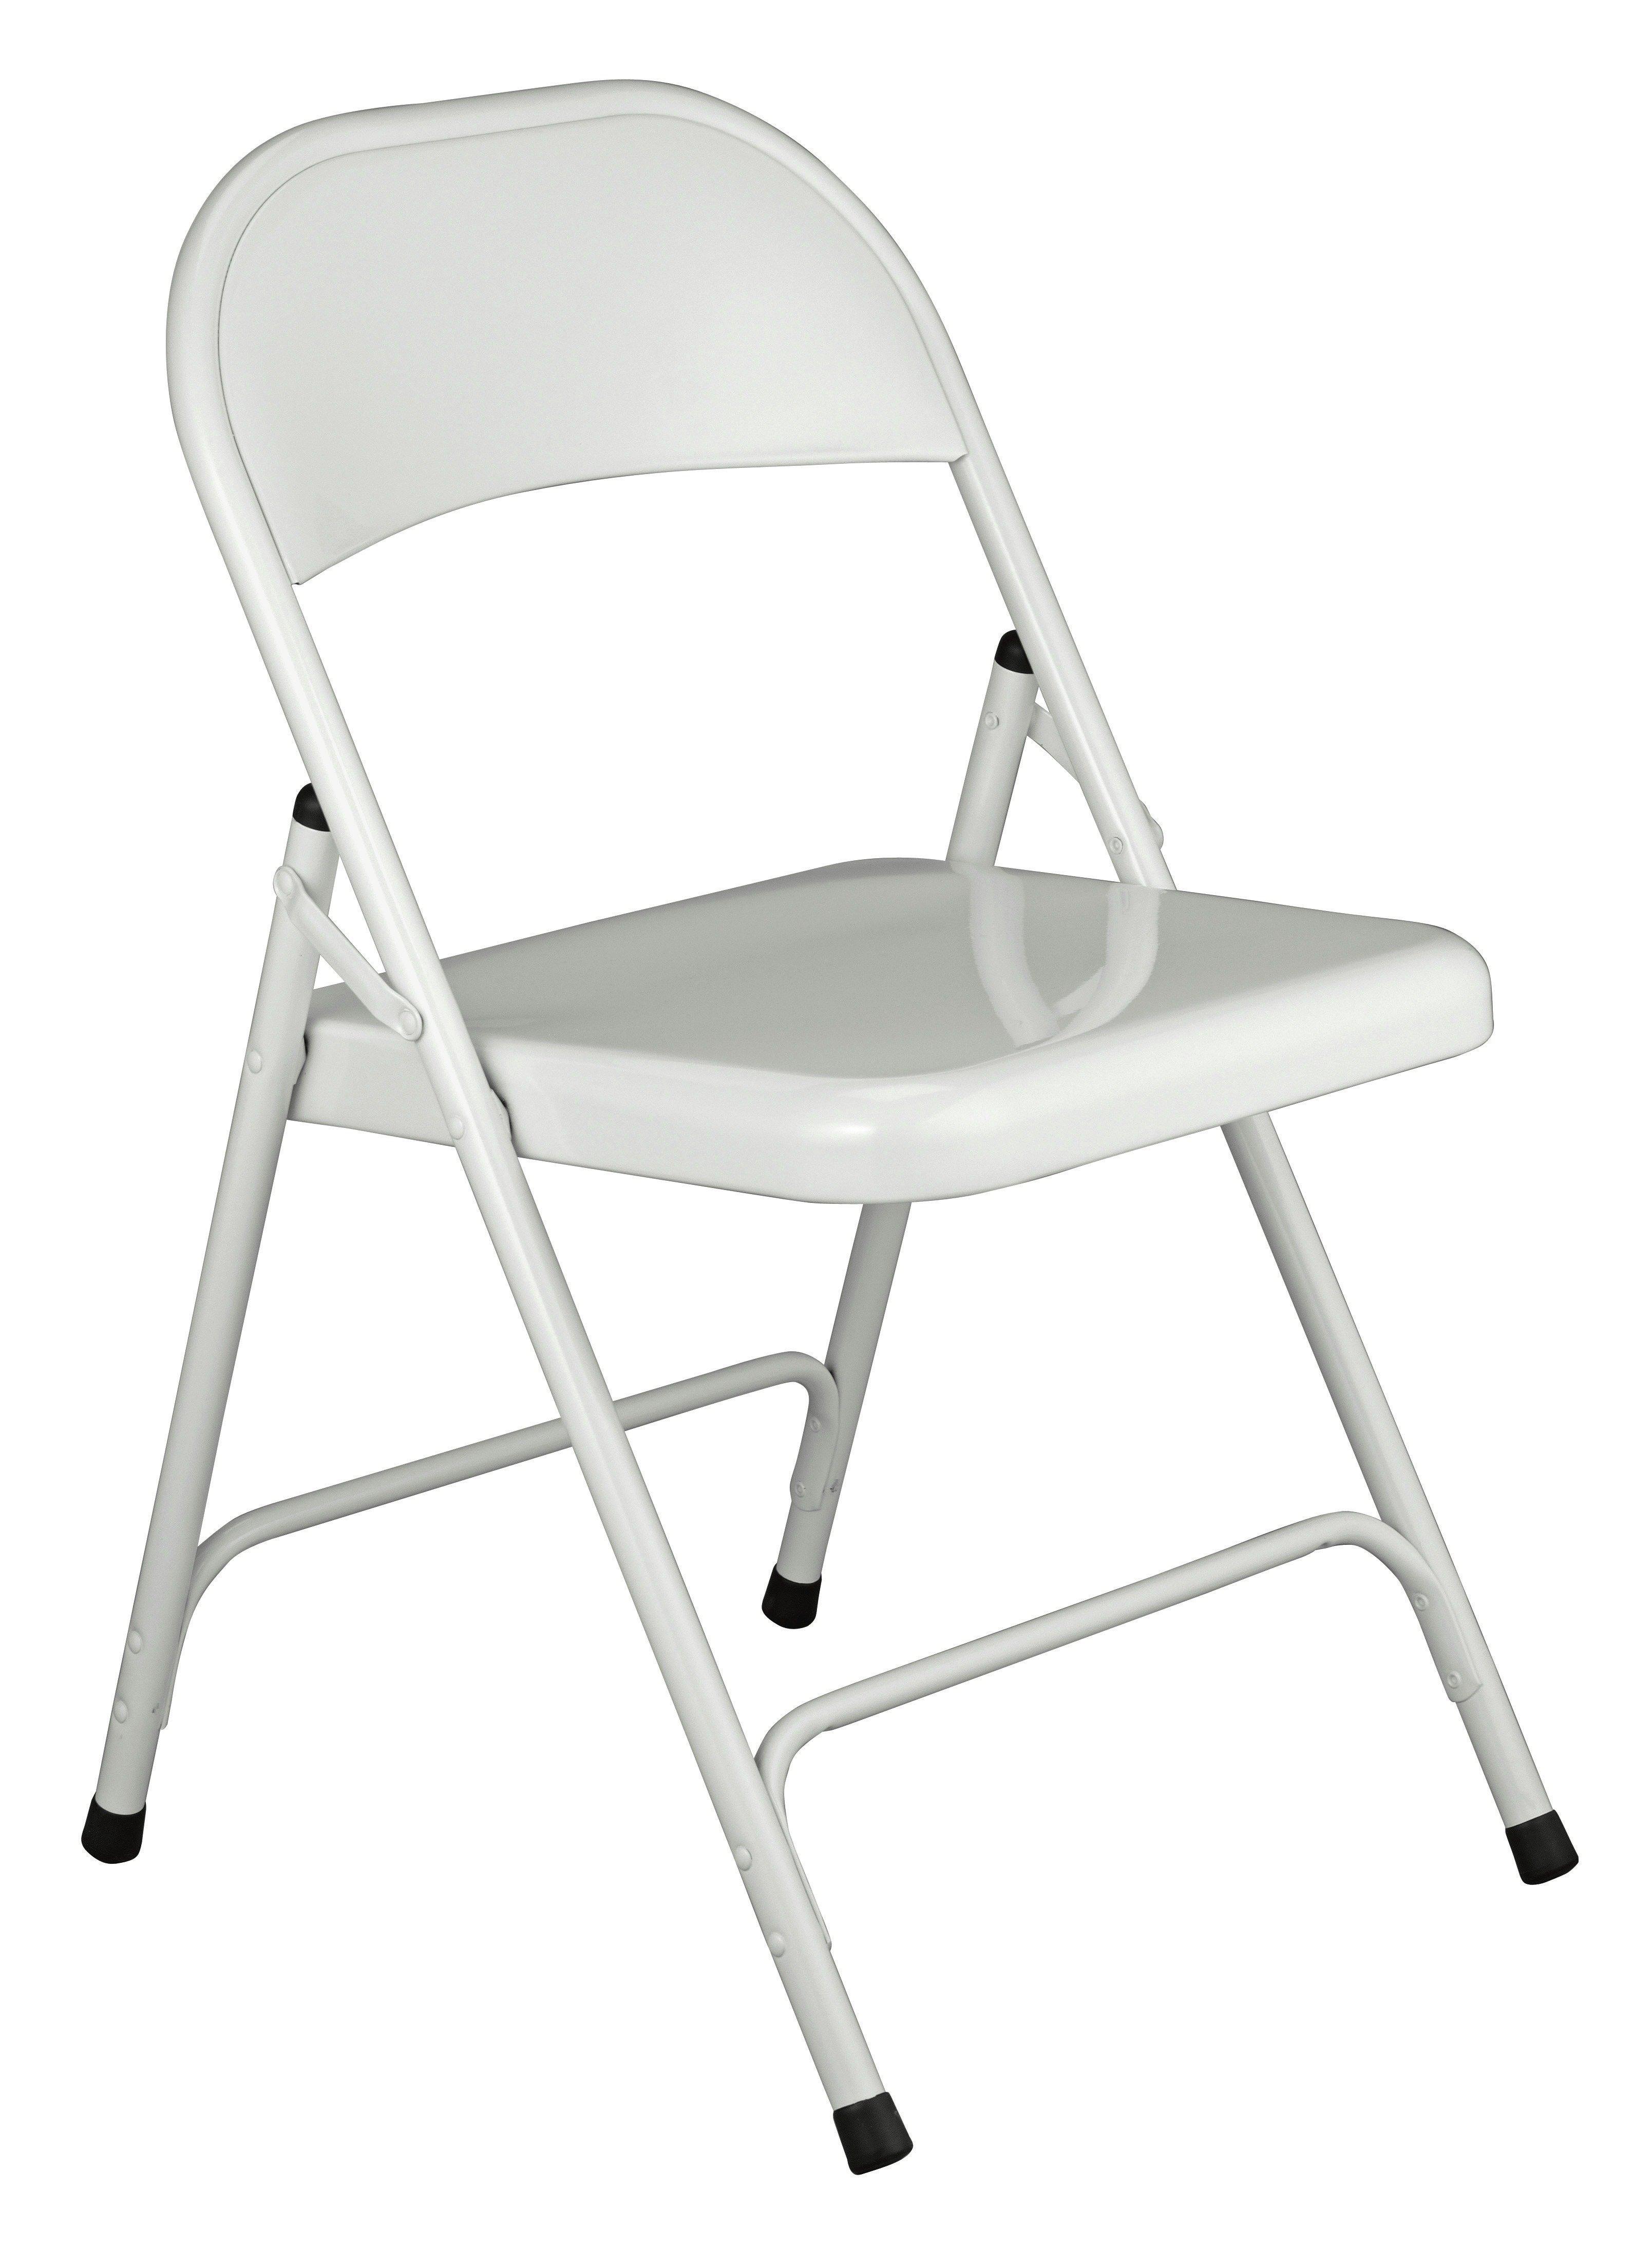 buy habitat macadam metal folding chair - white at argos.co.uk